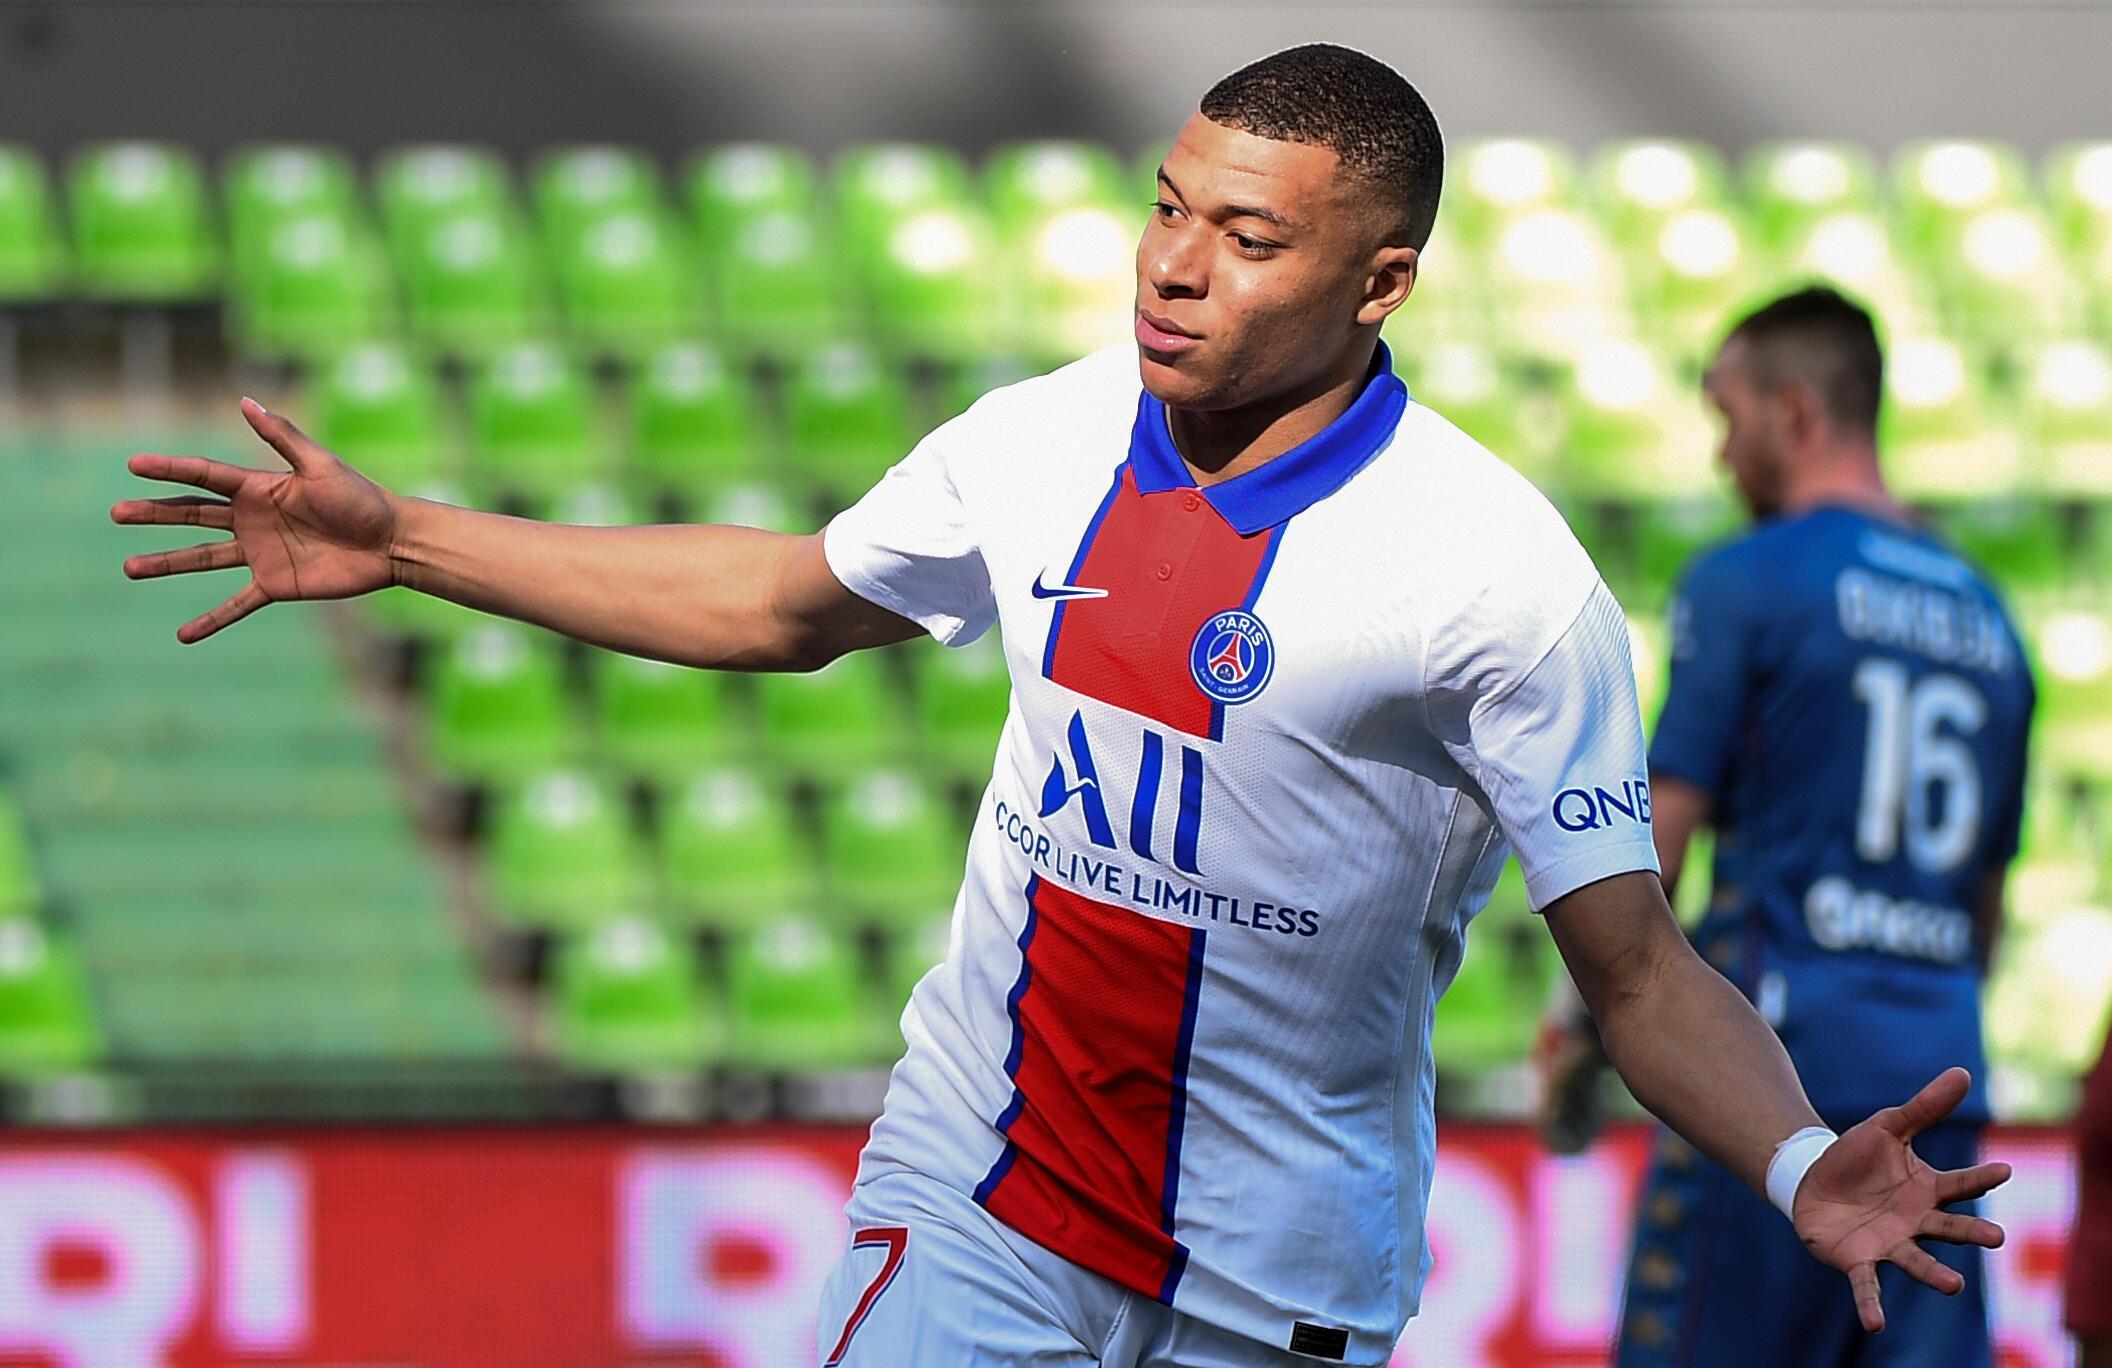 Kylian Mbappe has scored 25 Ligue 1 goals this season